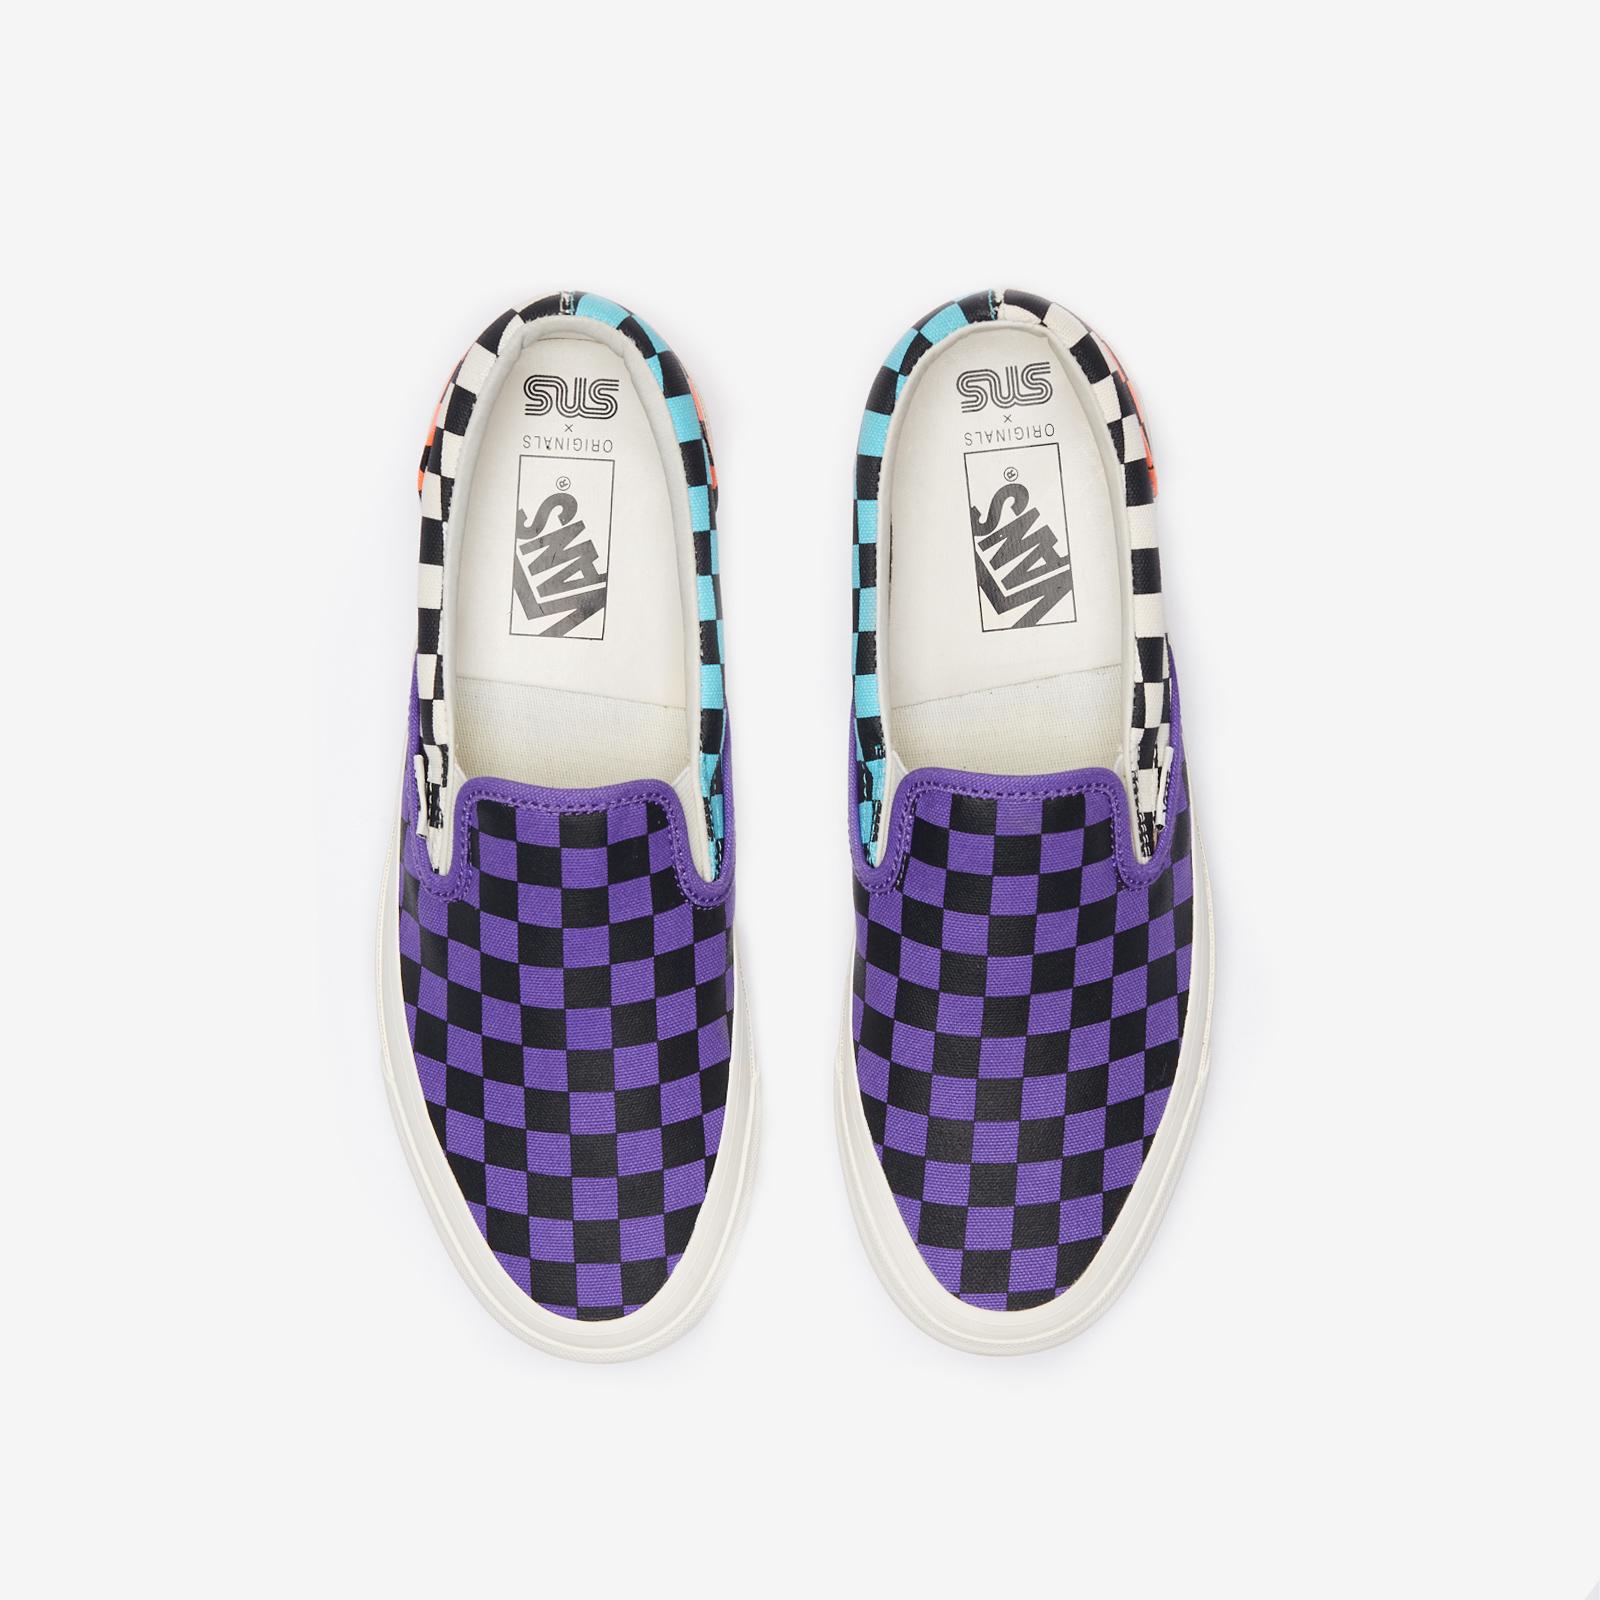 Vans OG Classic Slip-On LX x Sneakersnstuff - Vn0a45jk01m - SNS ...